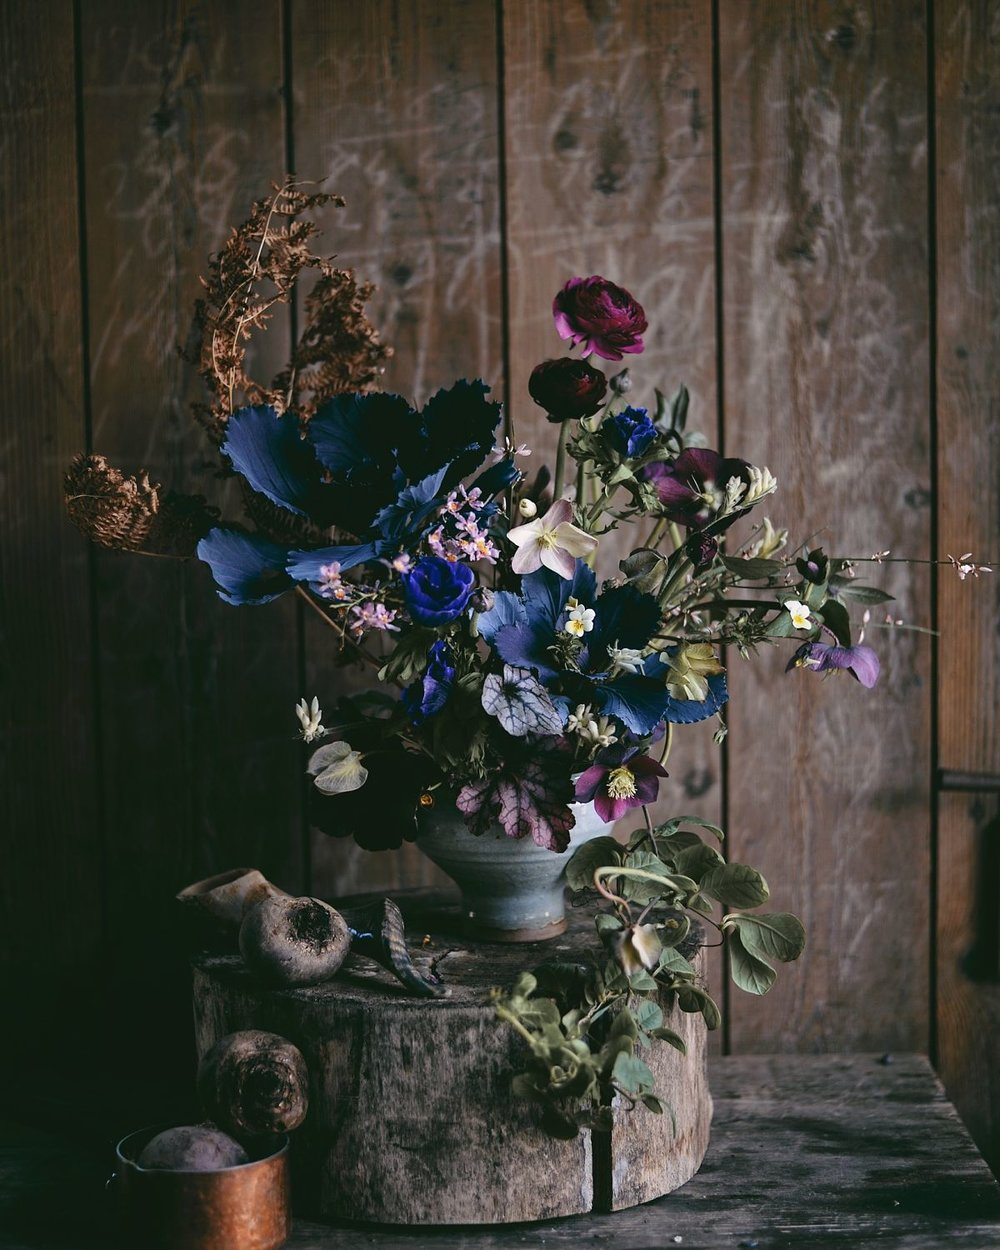 ikoflowers_winter_8_opt.jpg